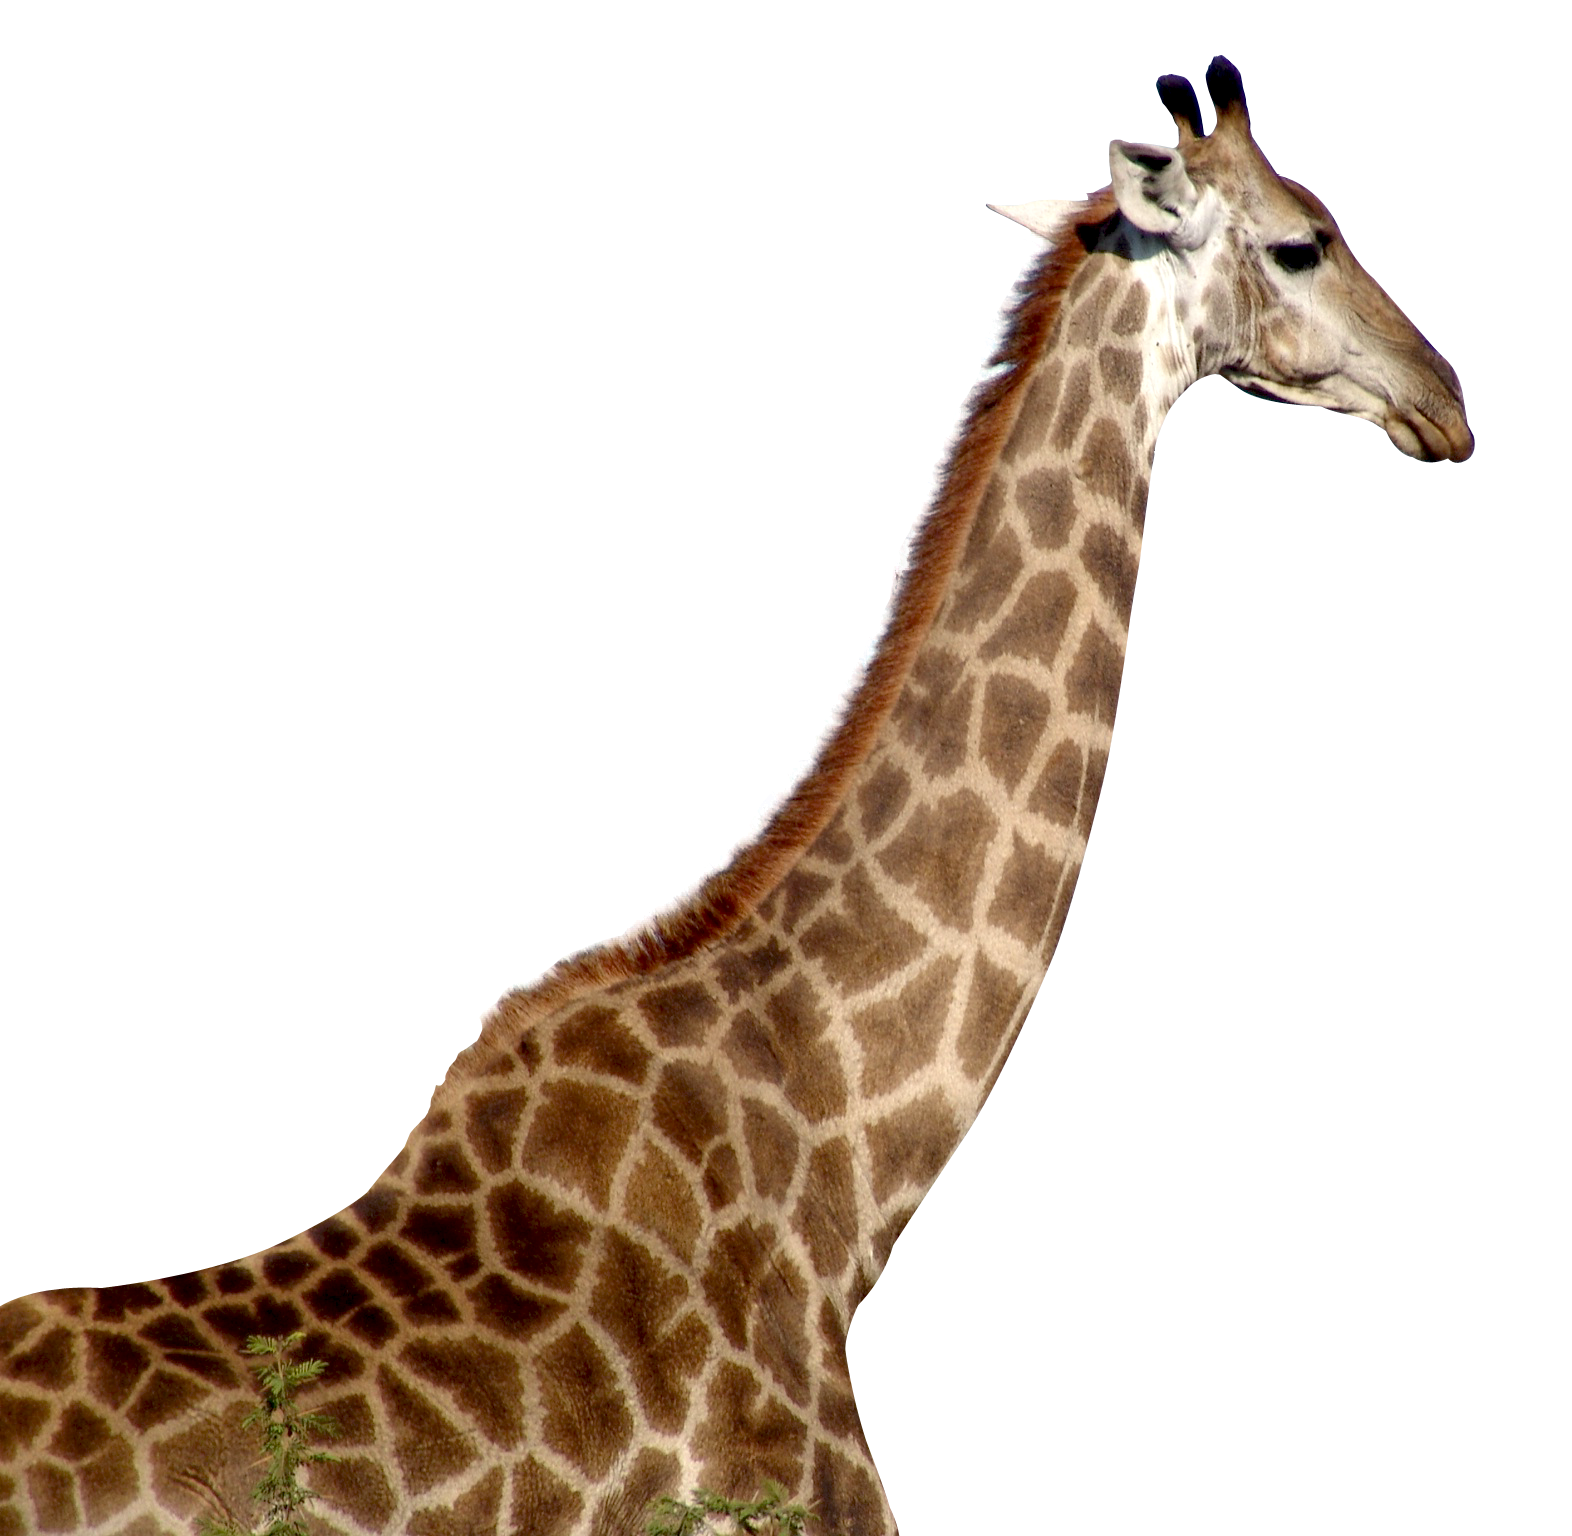 Giraffe PNG Transparent Images.